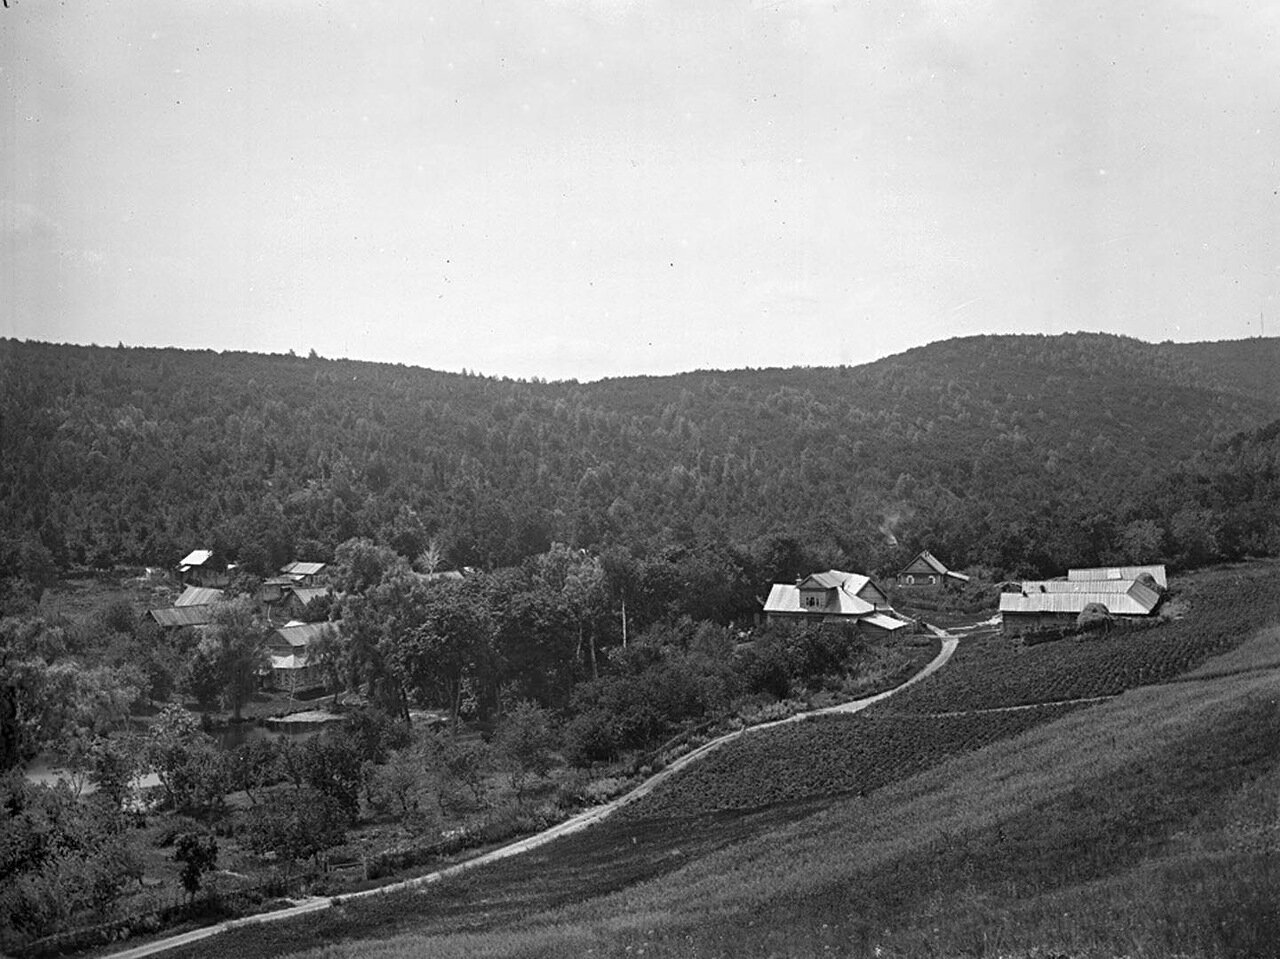 ������� �����. ����� ���. 1894 �. �. ��������